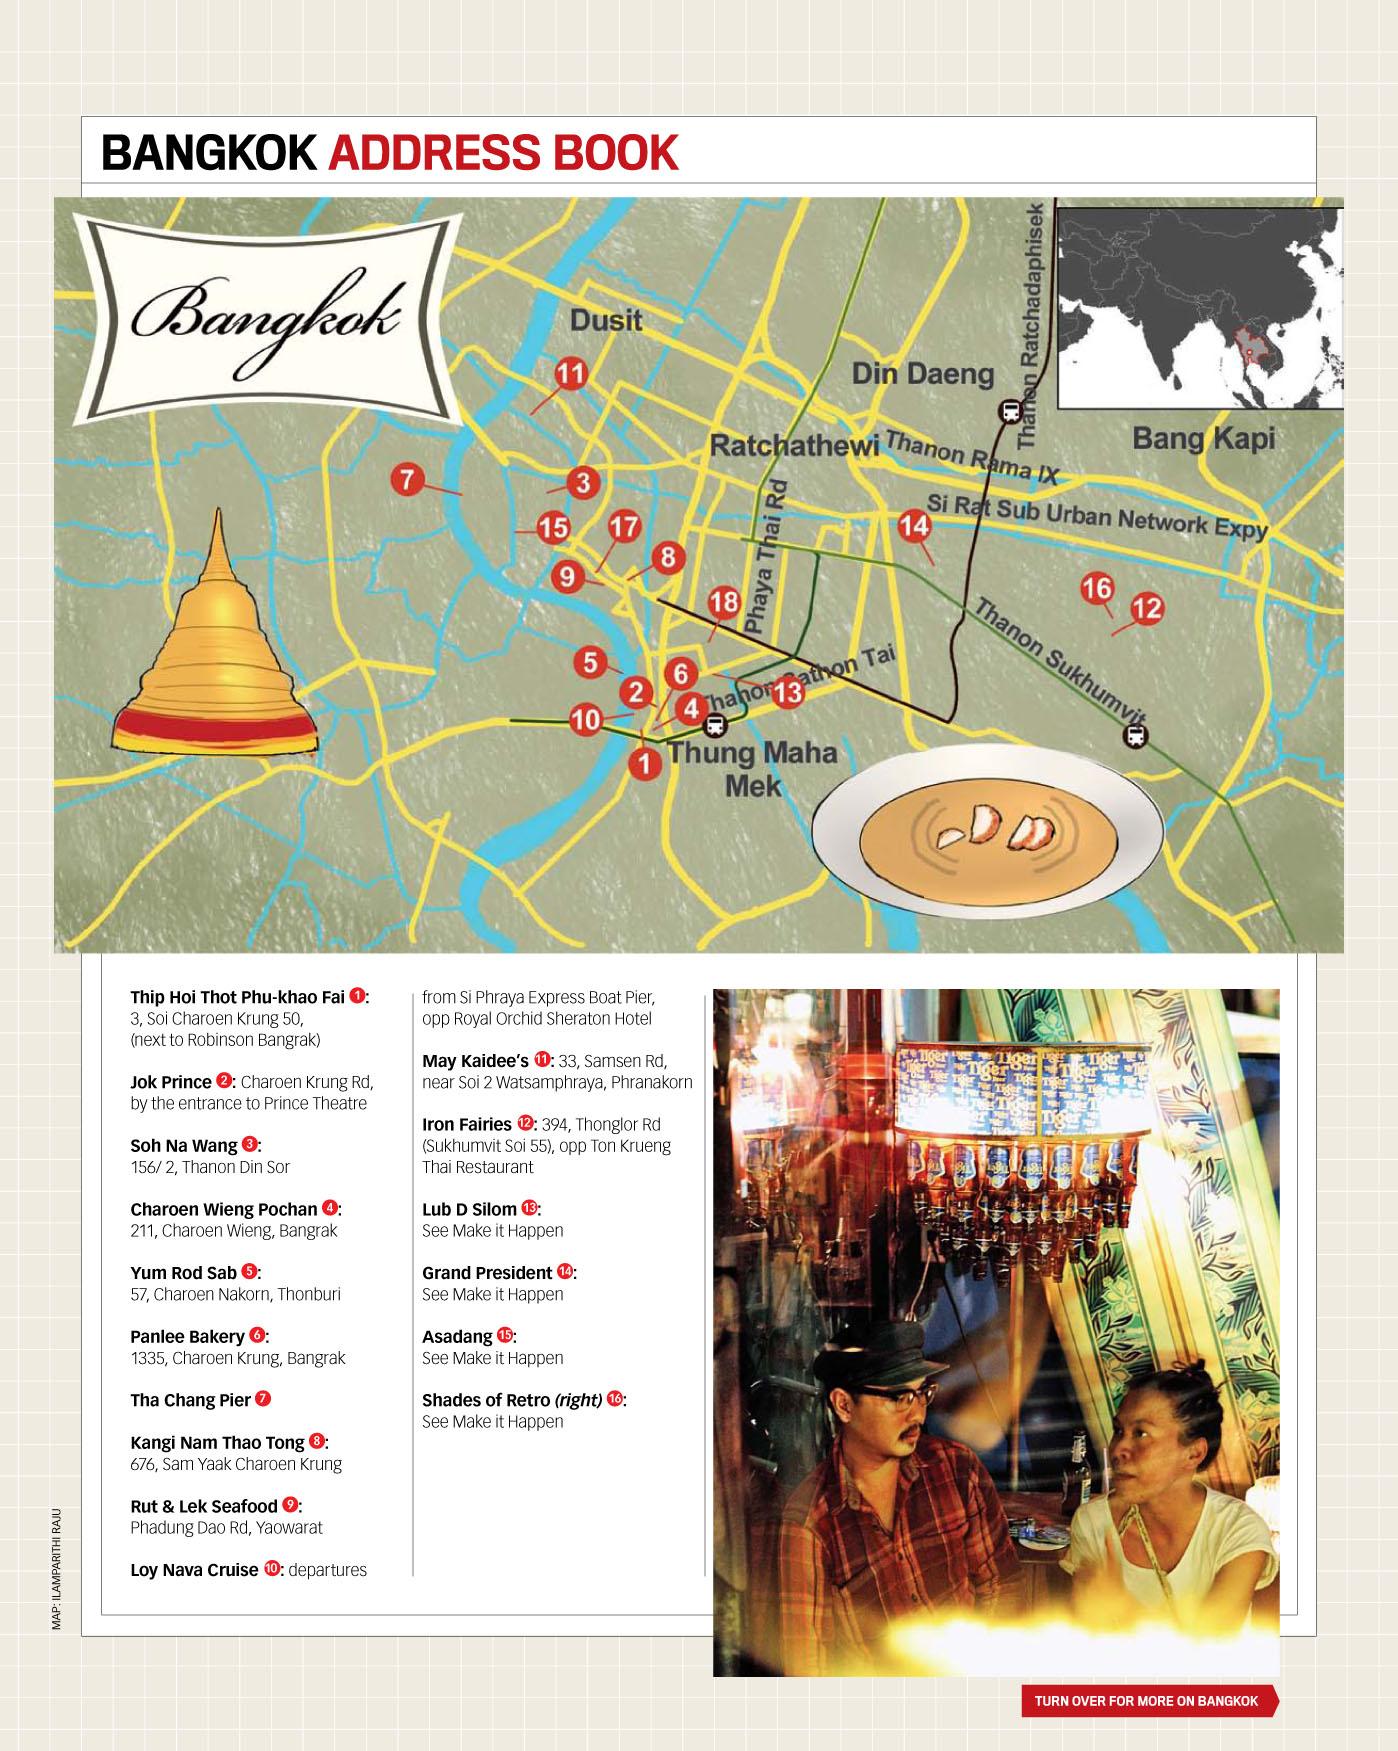 Lonely Planet Magazine India 2013-02-08.jpg